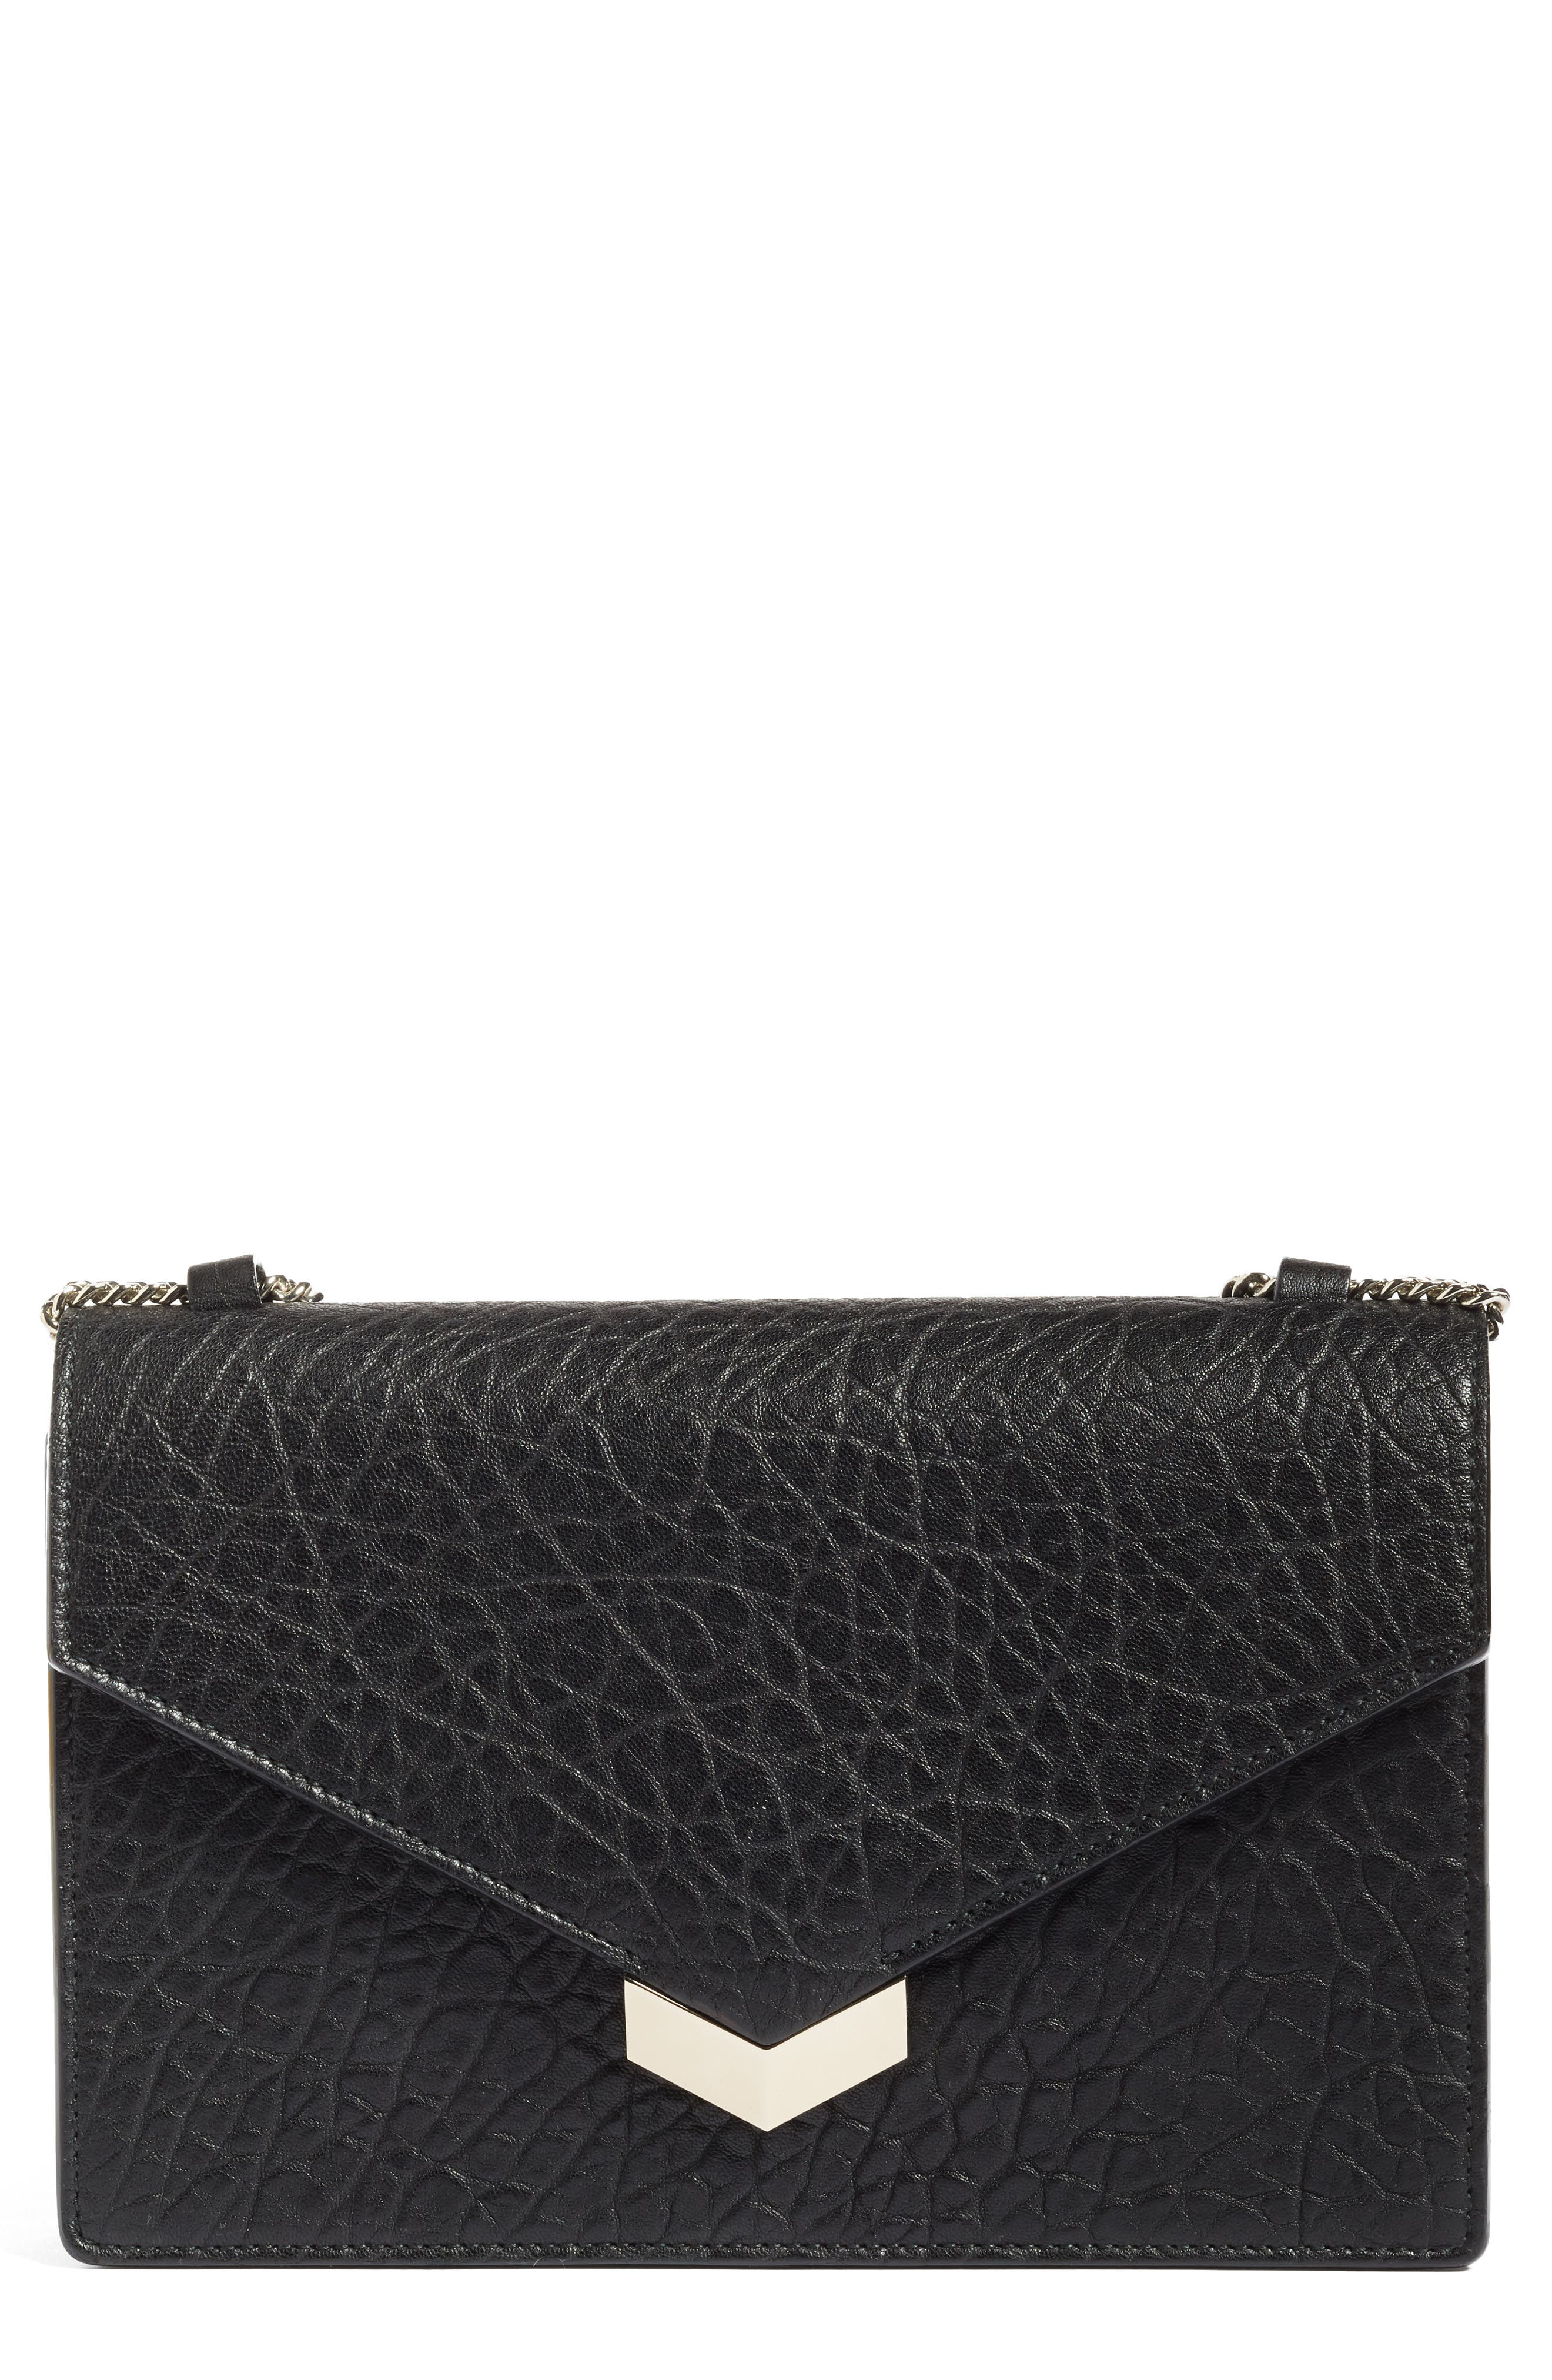 Leila Grainy Lambskin Leather Crossbody Bag,                             Alternate thumbnail 2, color,                             001